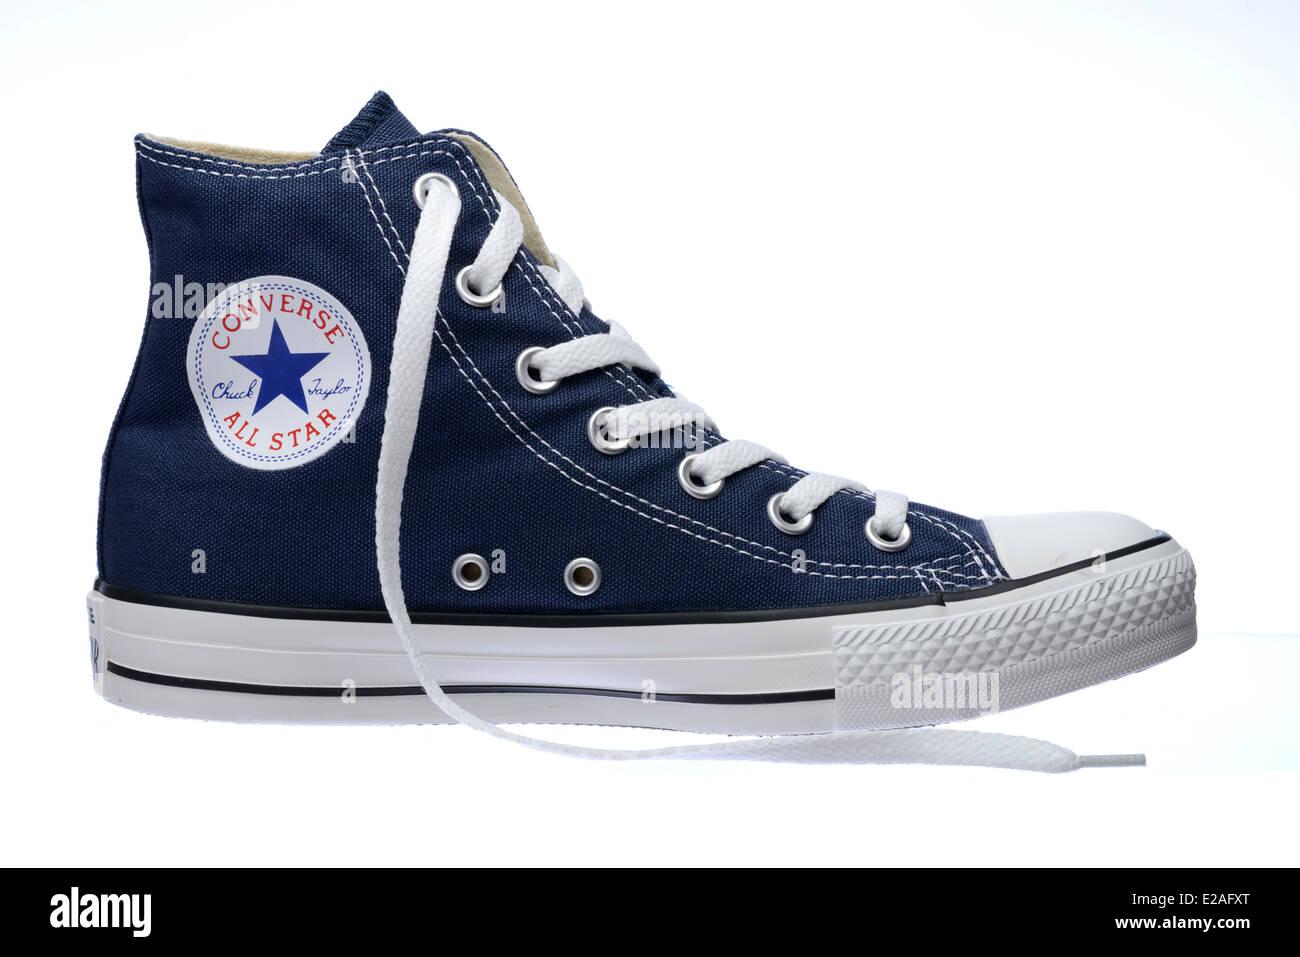 Converse ChuckTaylor All Star blu